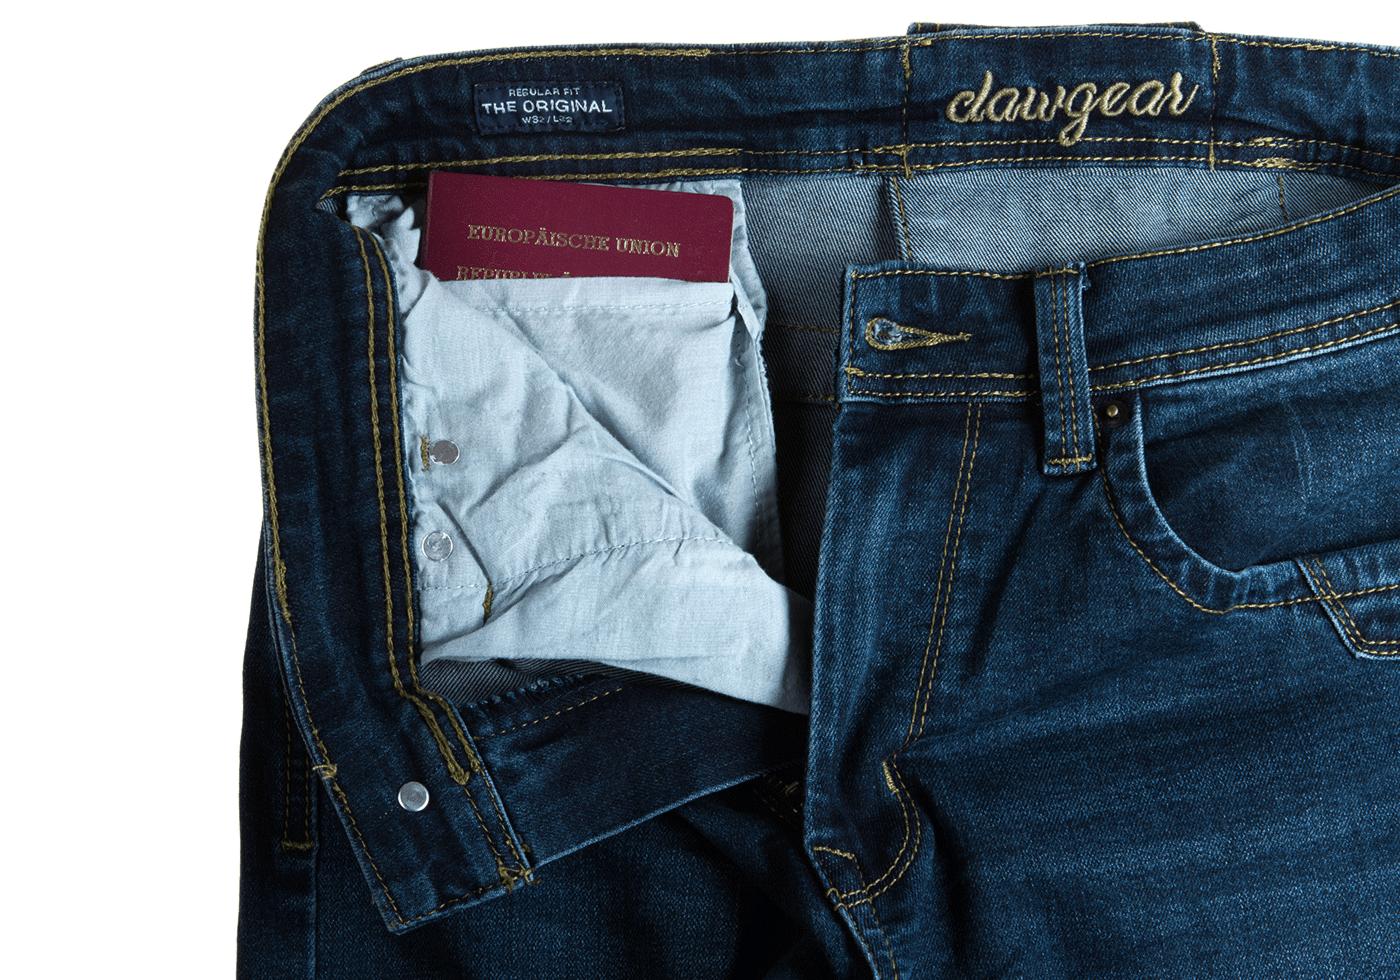 1a84a9ad00f3 Blue Denim Tactical Flex Jeans Midnight 40/32 - Denim - Garments -  clawgear.com Online shop